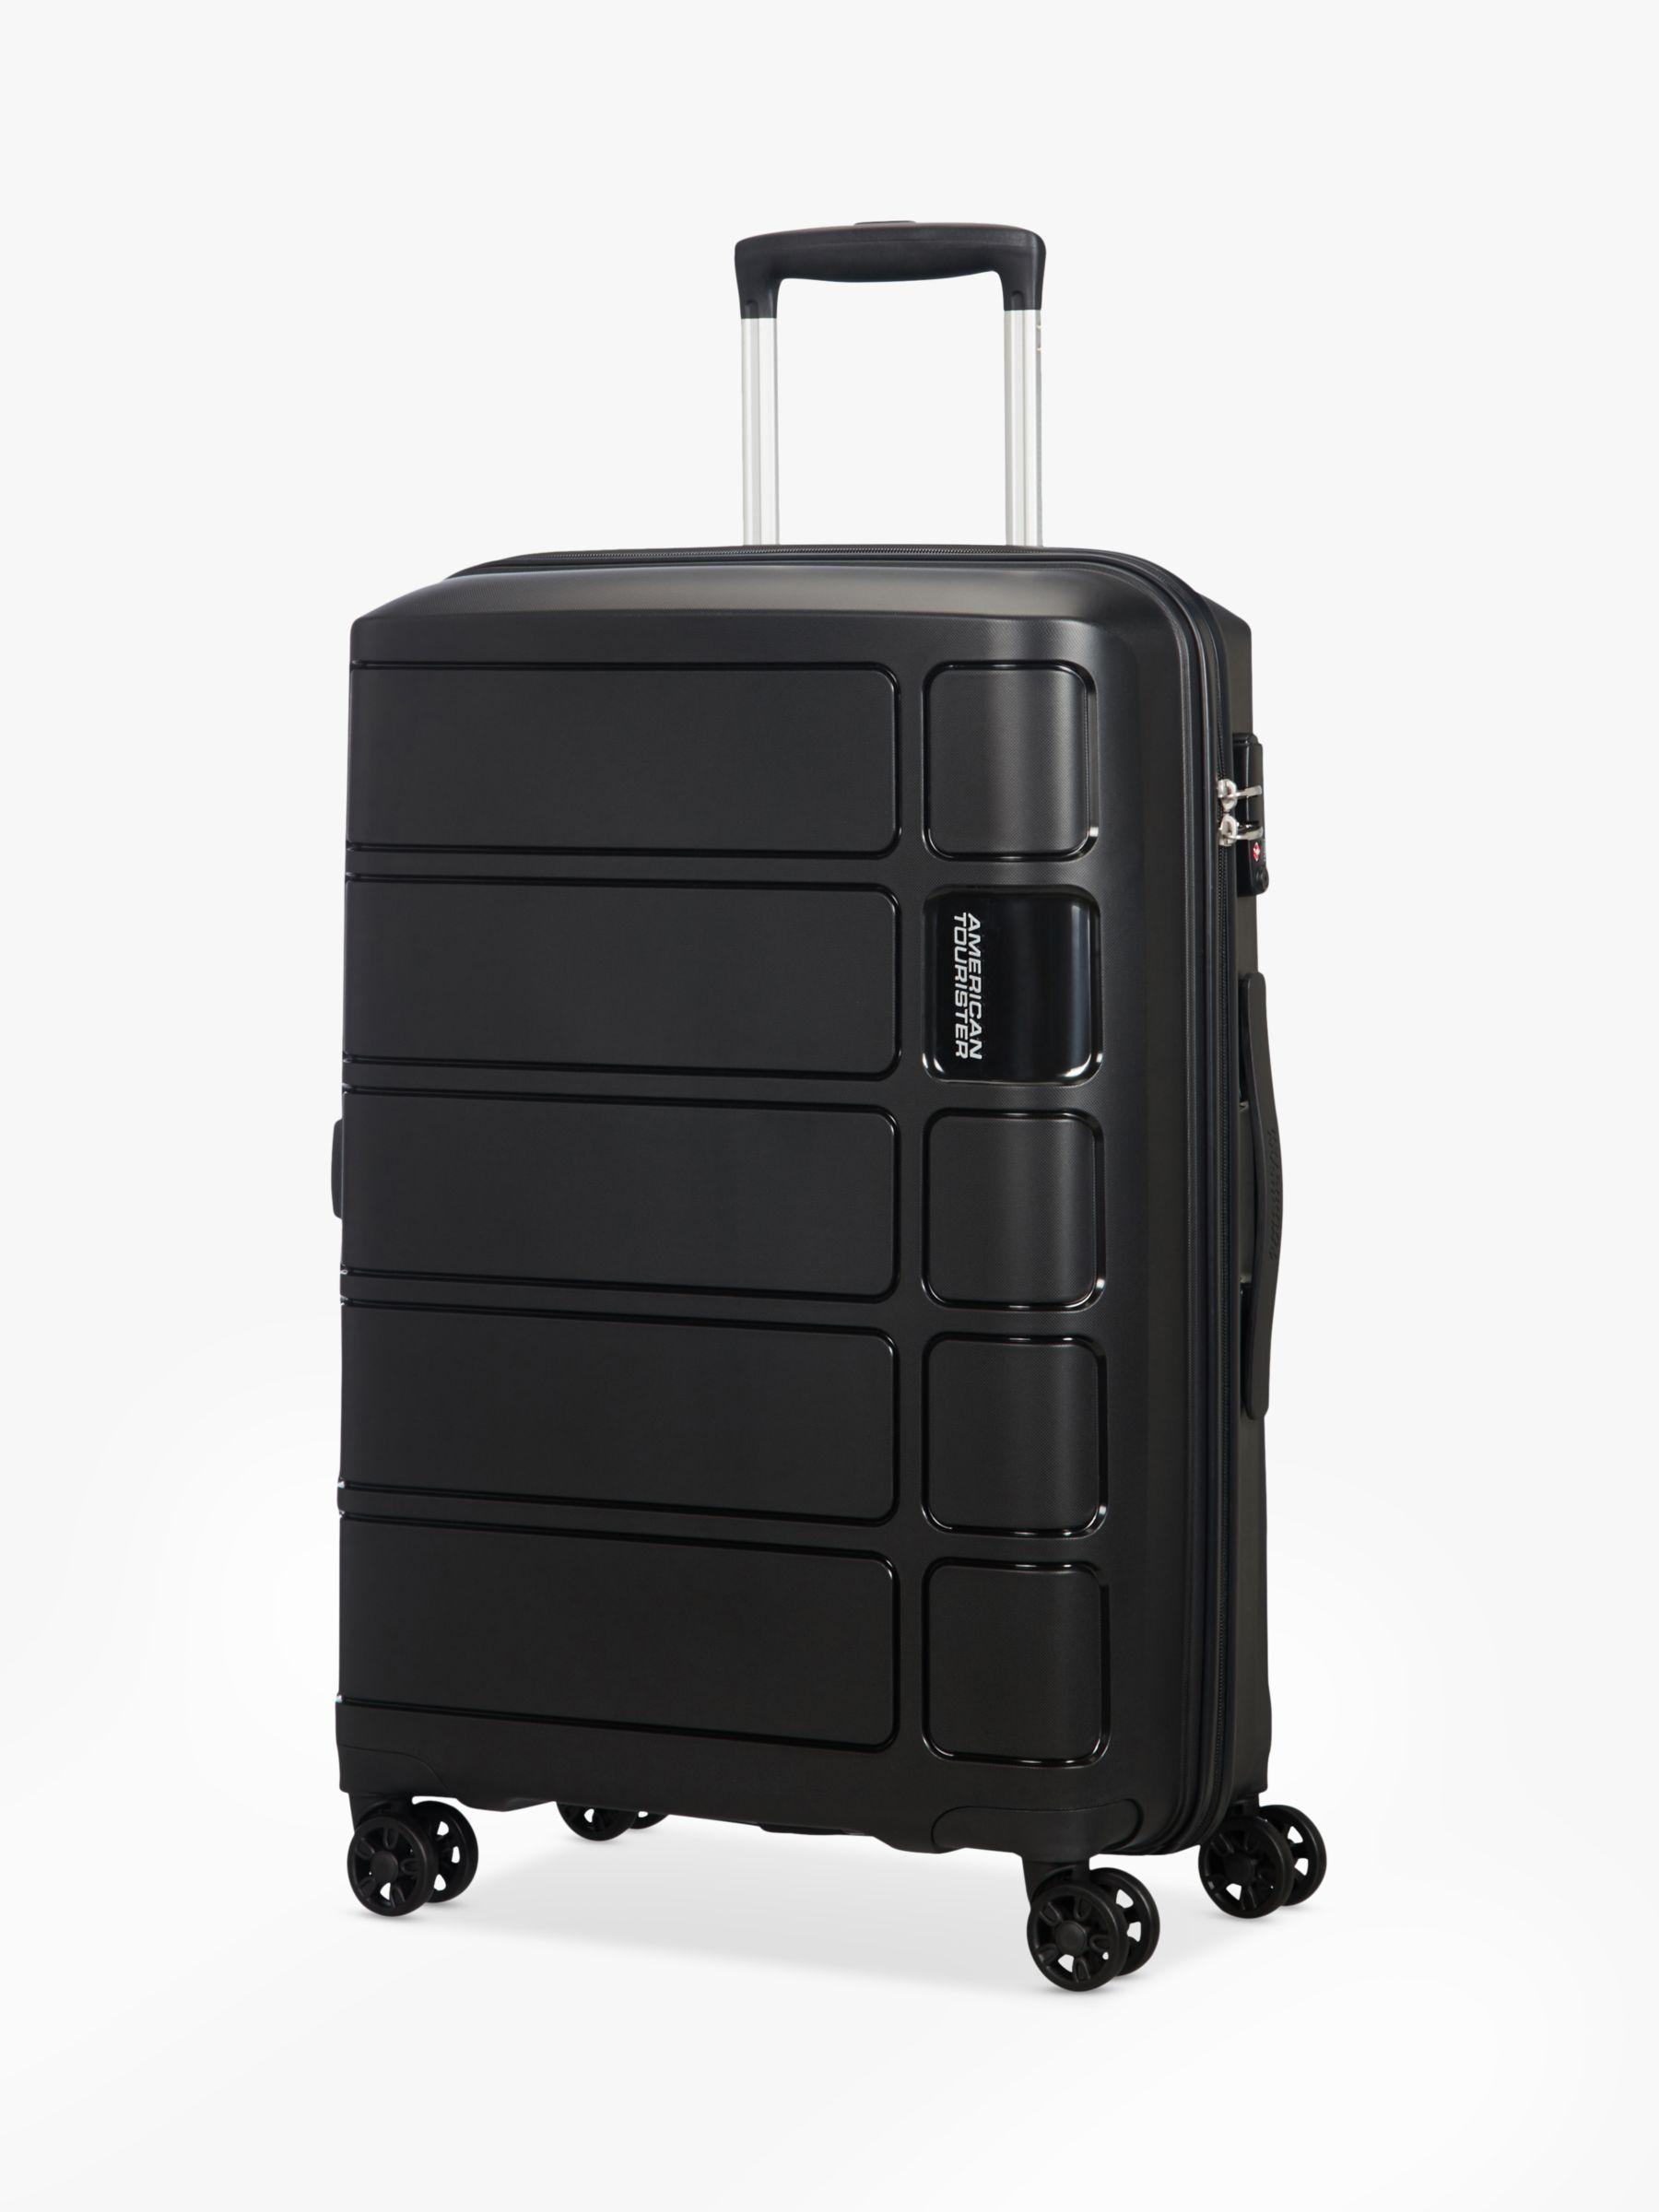 American Tourister American Tourister Summer Splash 4-Wheel 77cm Large Case